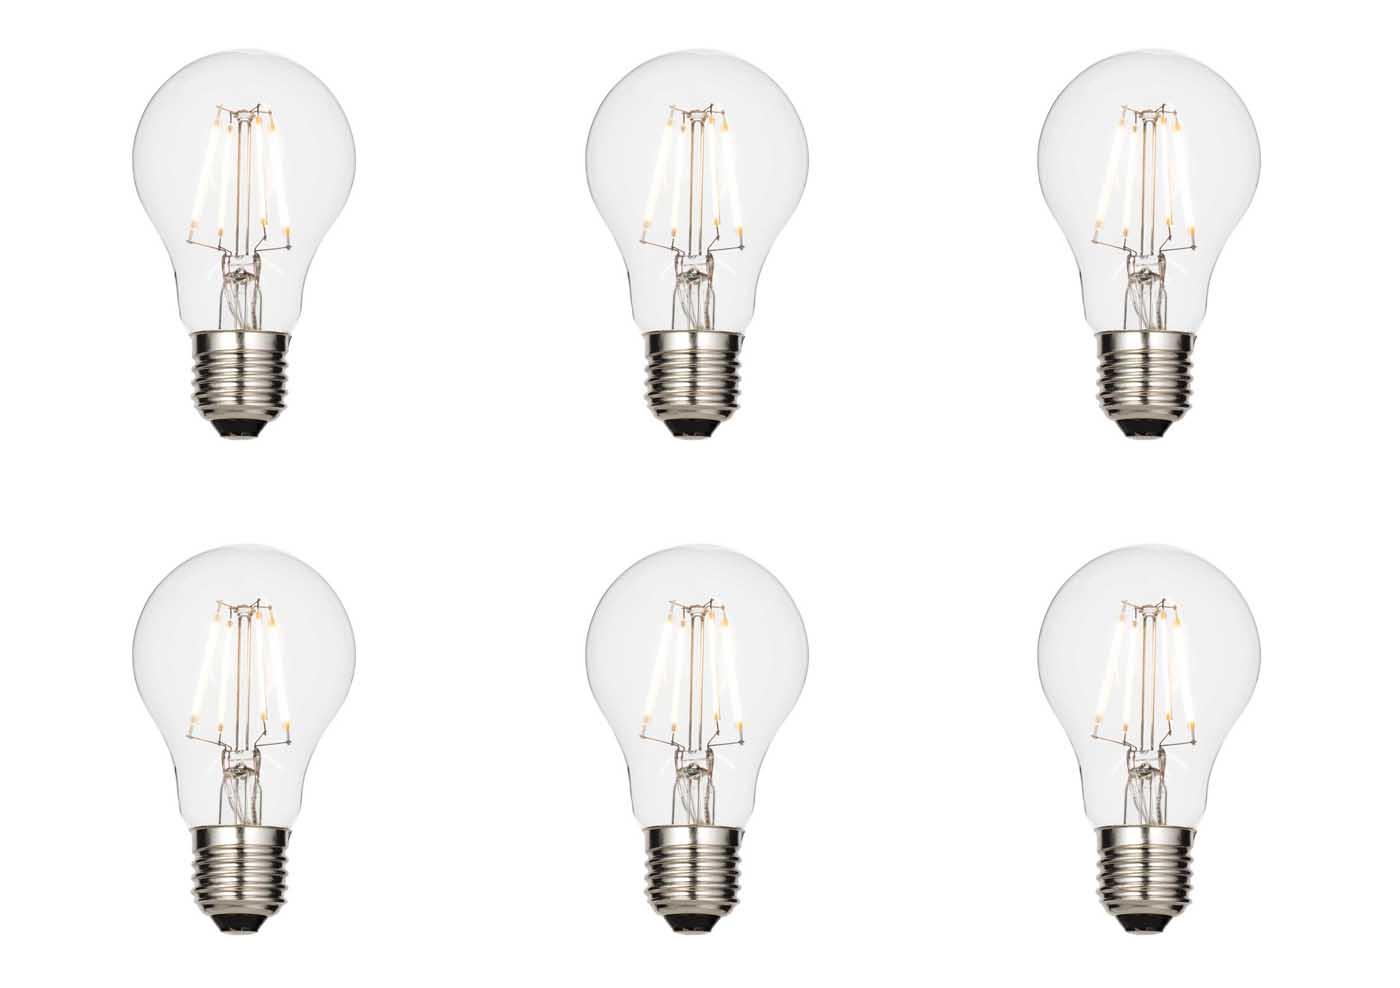 6 X Saxby E27 Led Light Bulb Filament Gls 4 3w Warm White